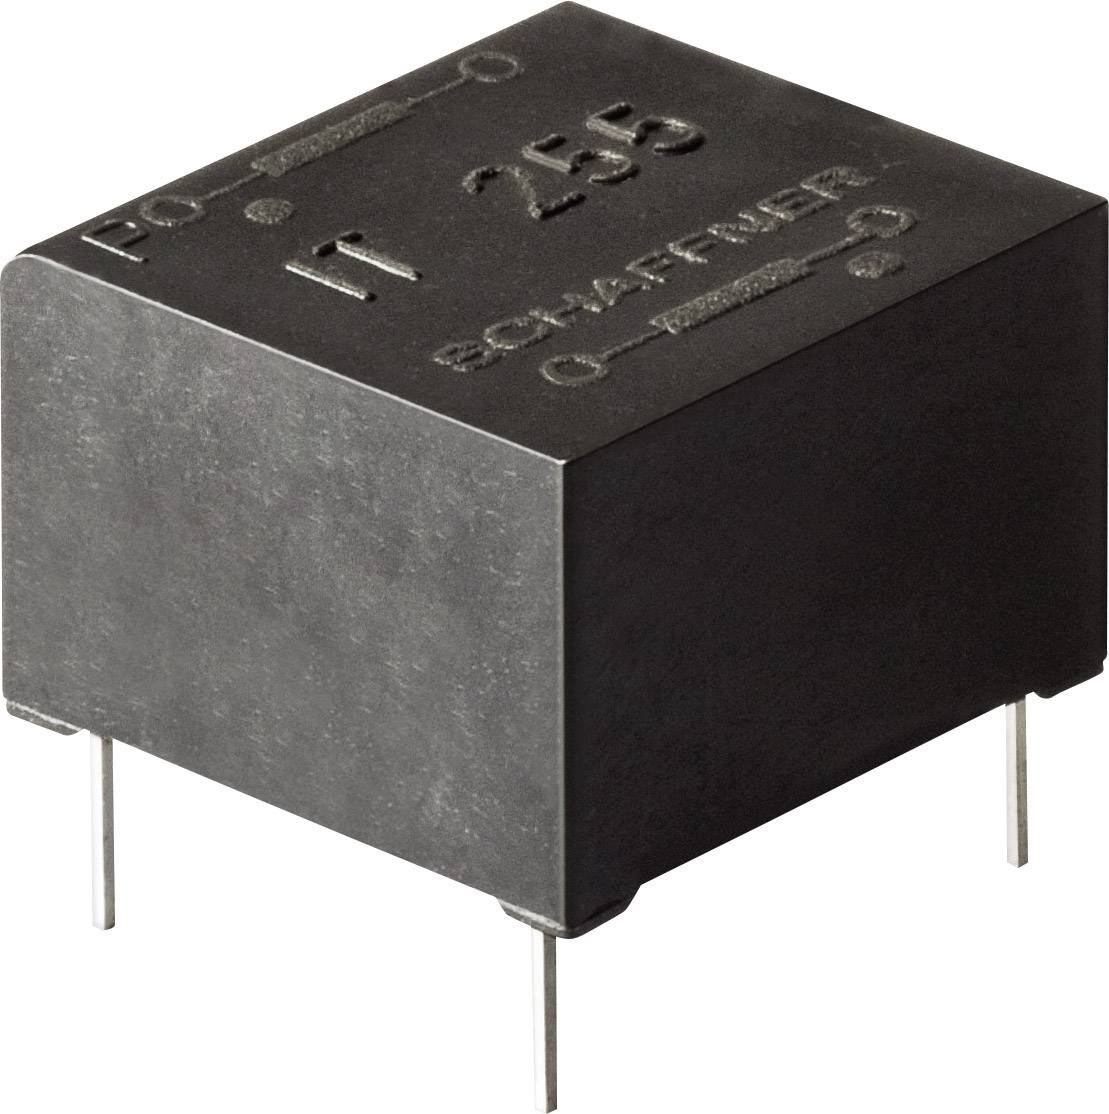 Pulzní transformátor Schaffner, IT255, 2,2 mH, max 3000 V